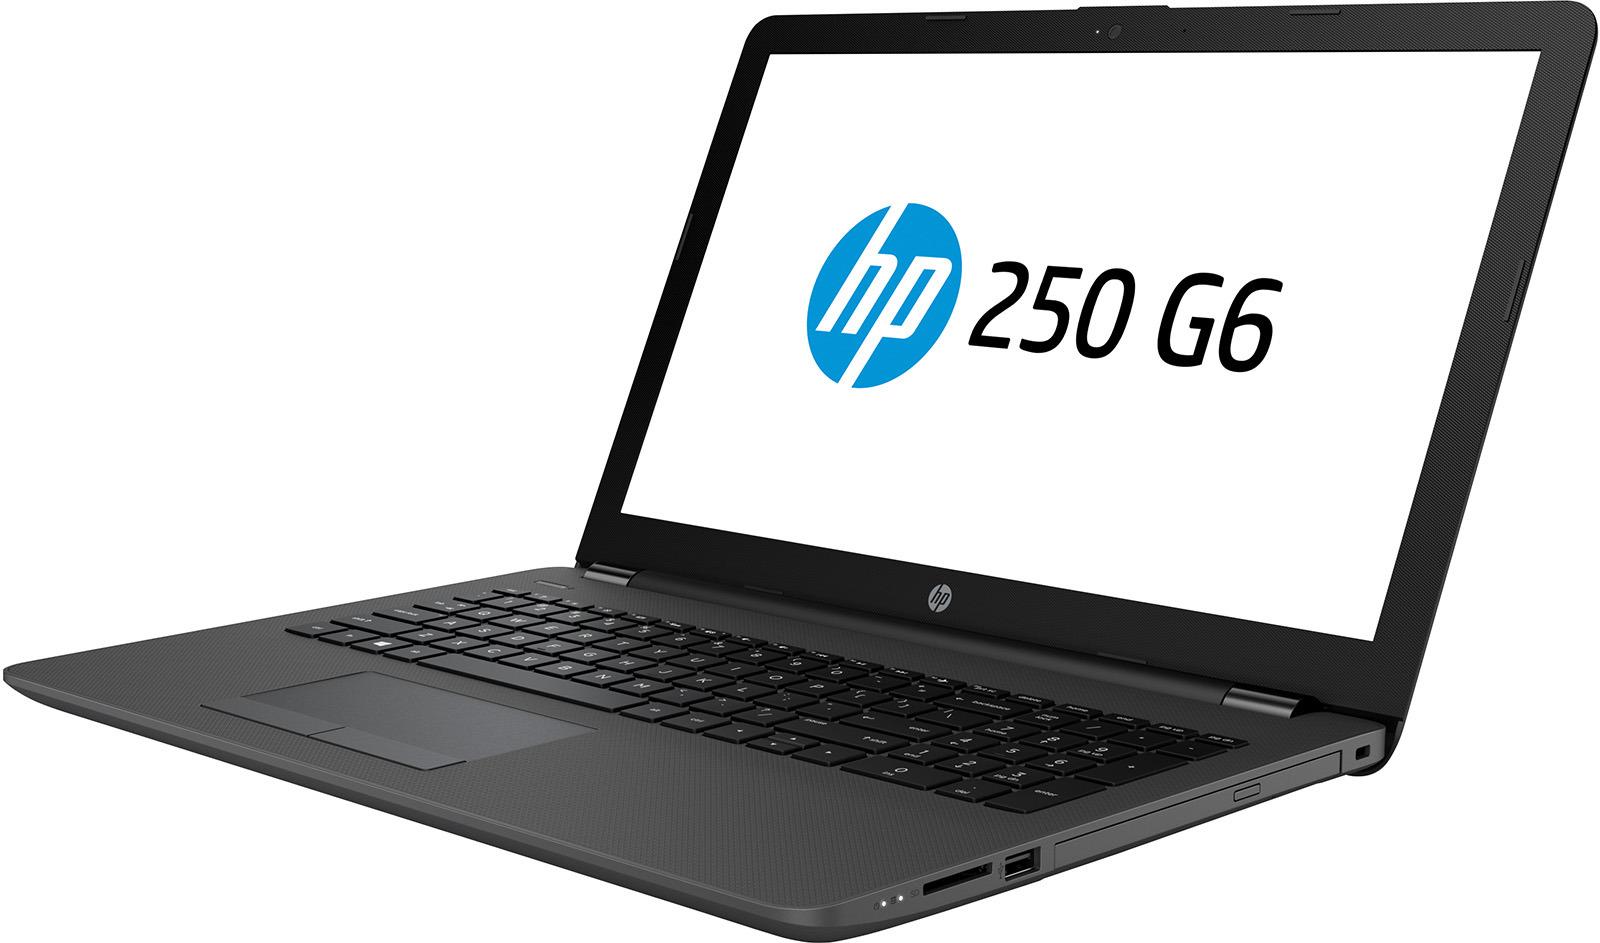 15.6 Ноутбук HP 250 G6 4LT13EA, серебристый